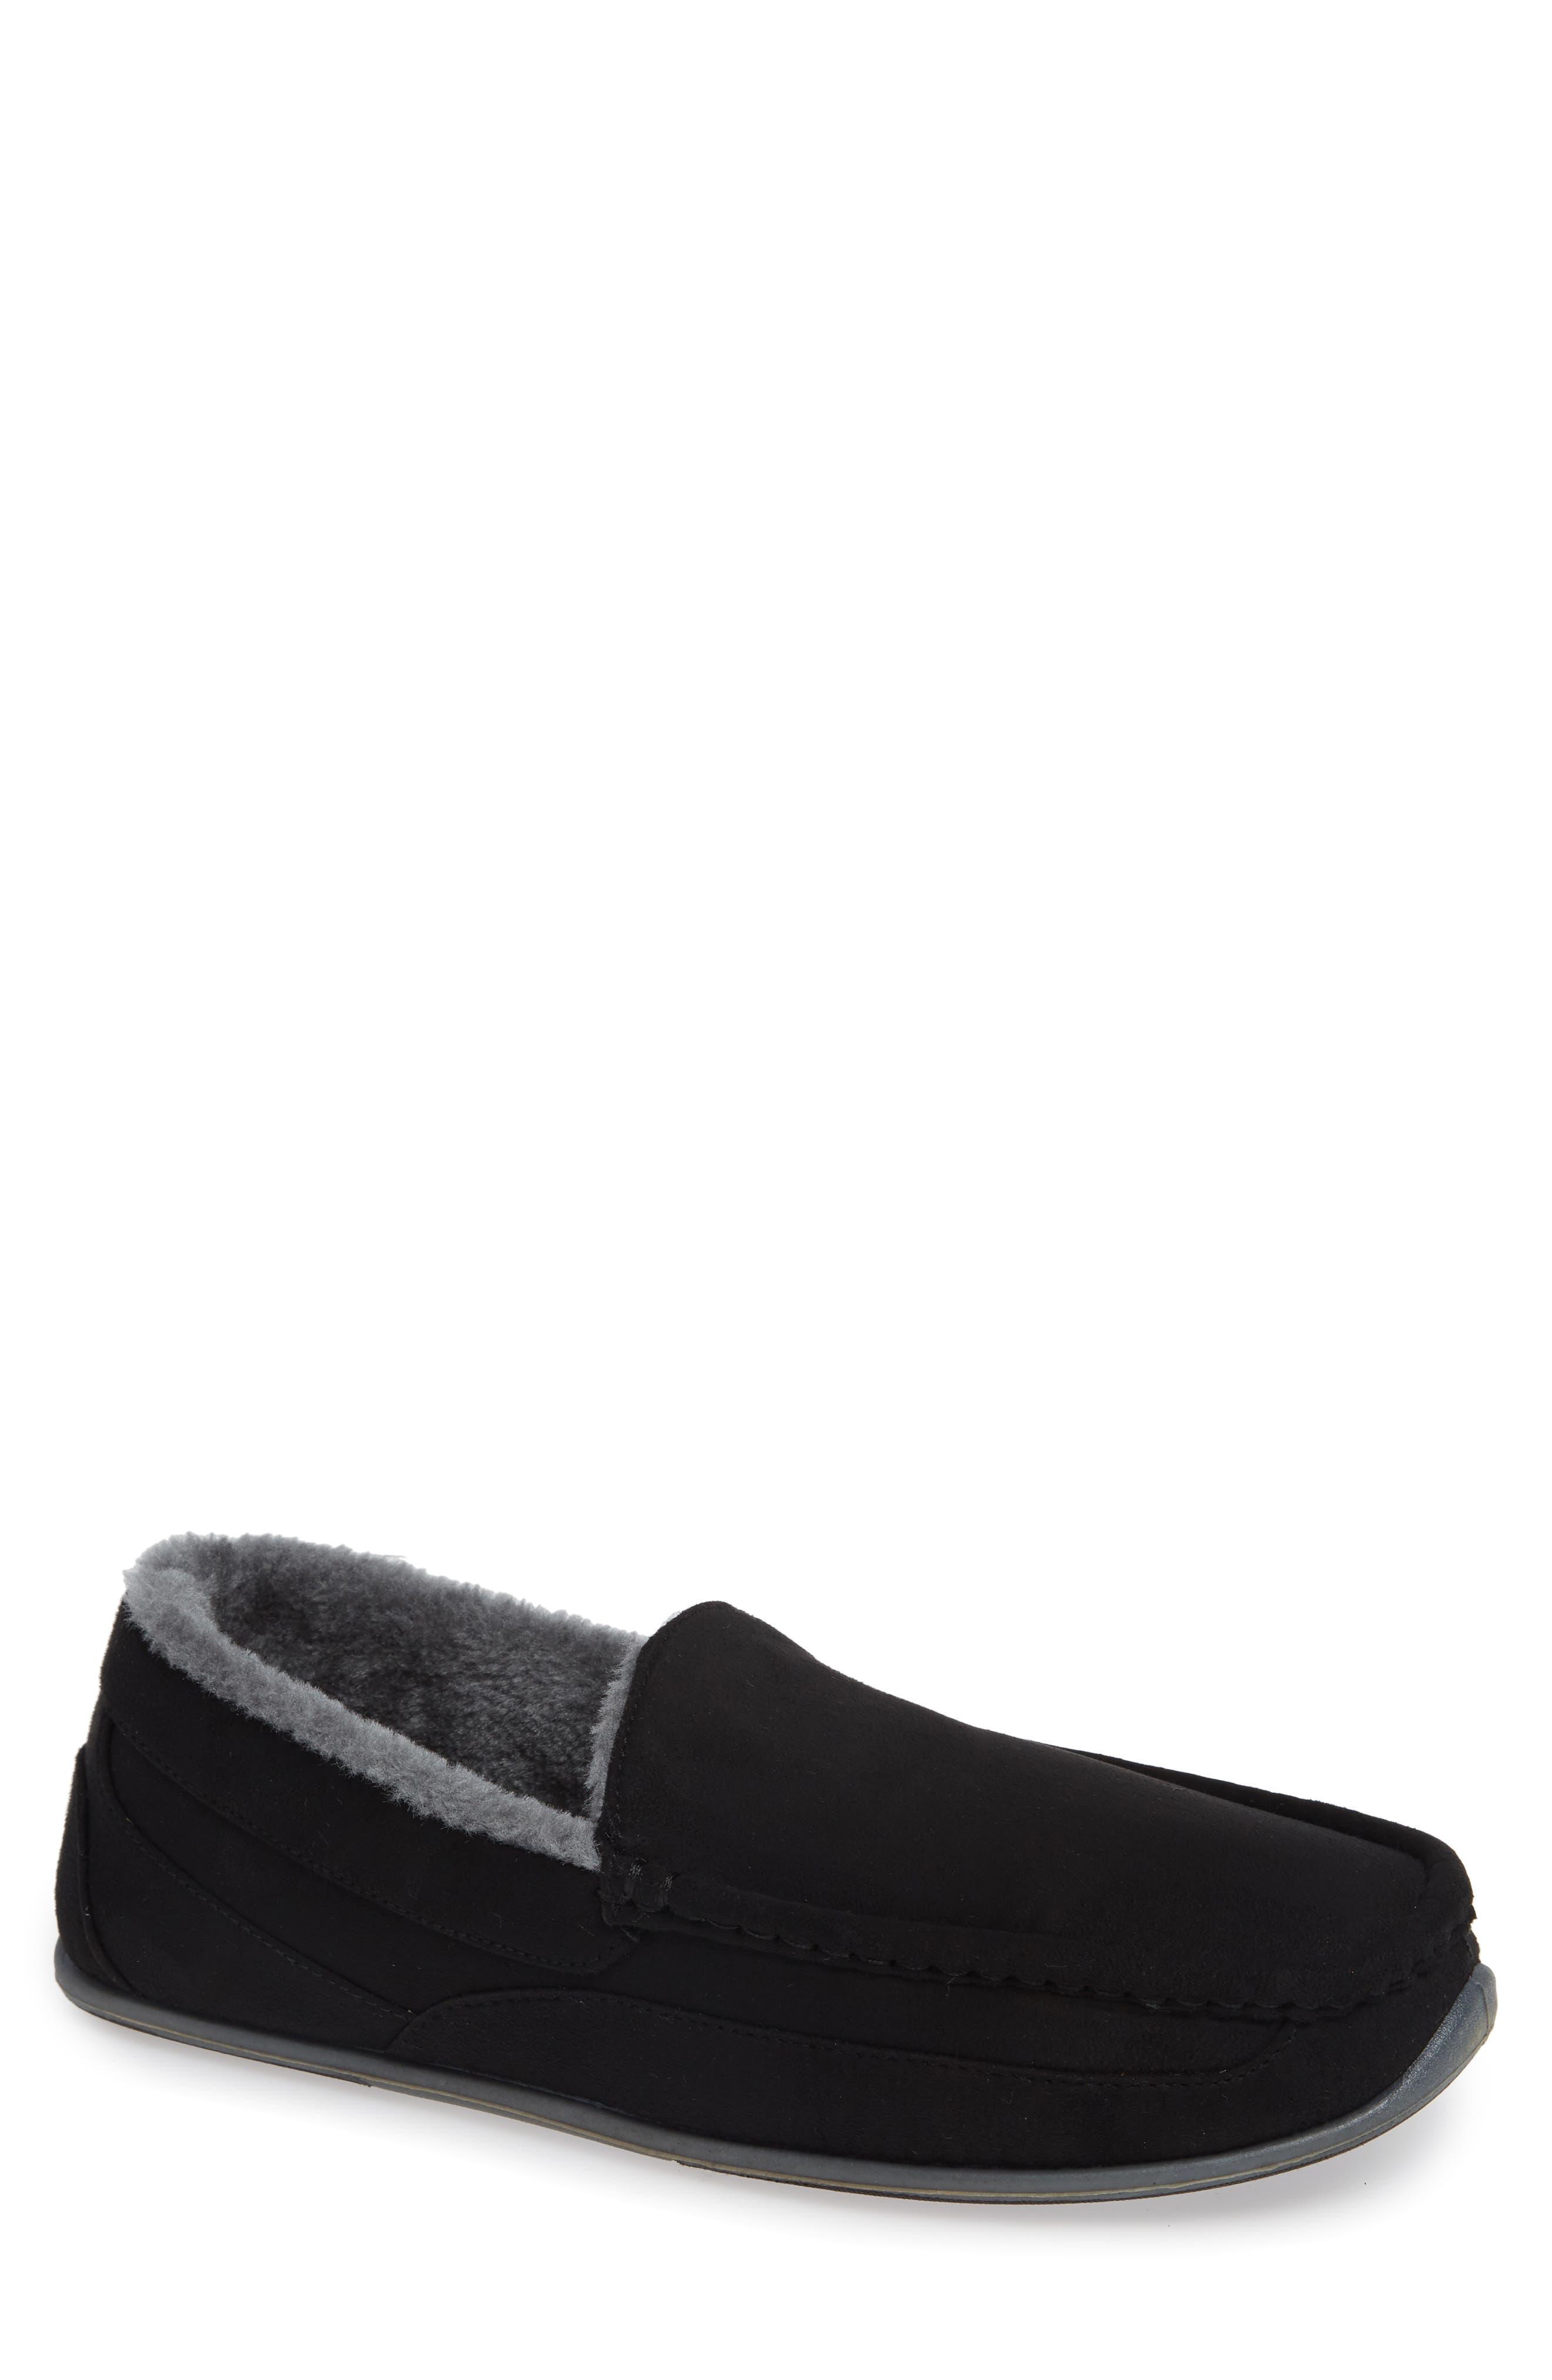 Spun Slipper,                         Main,                         color, BLACK